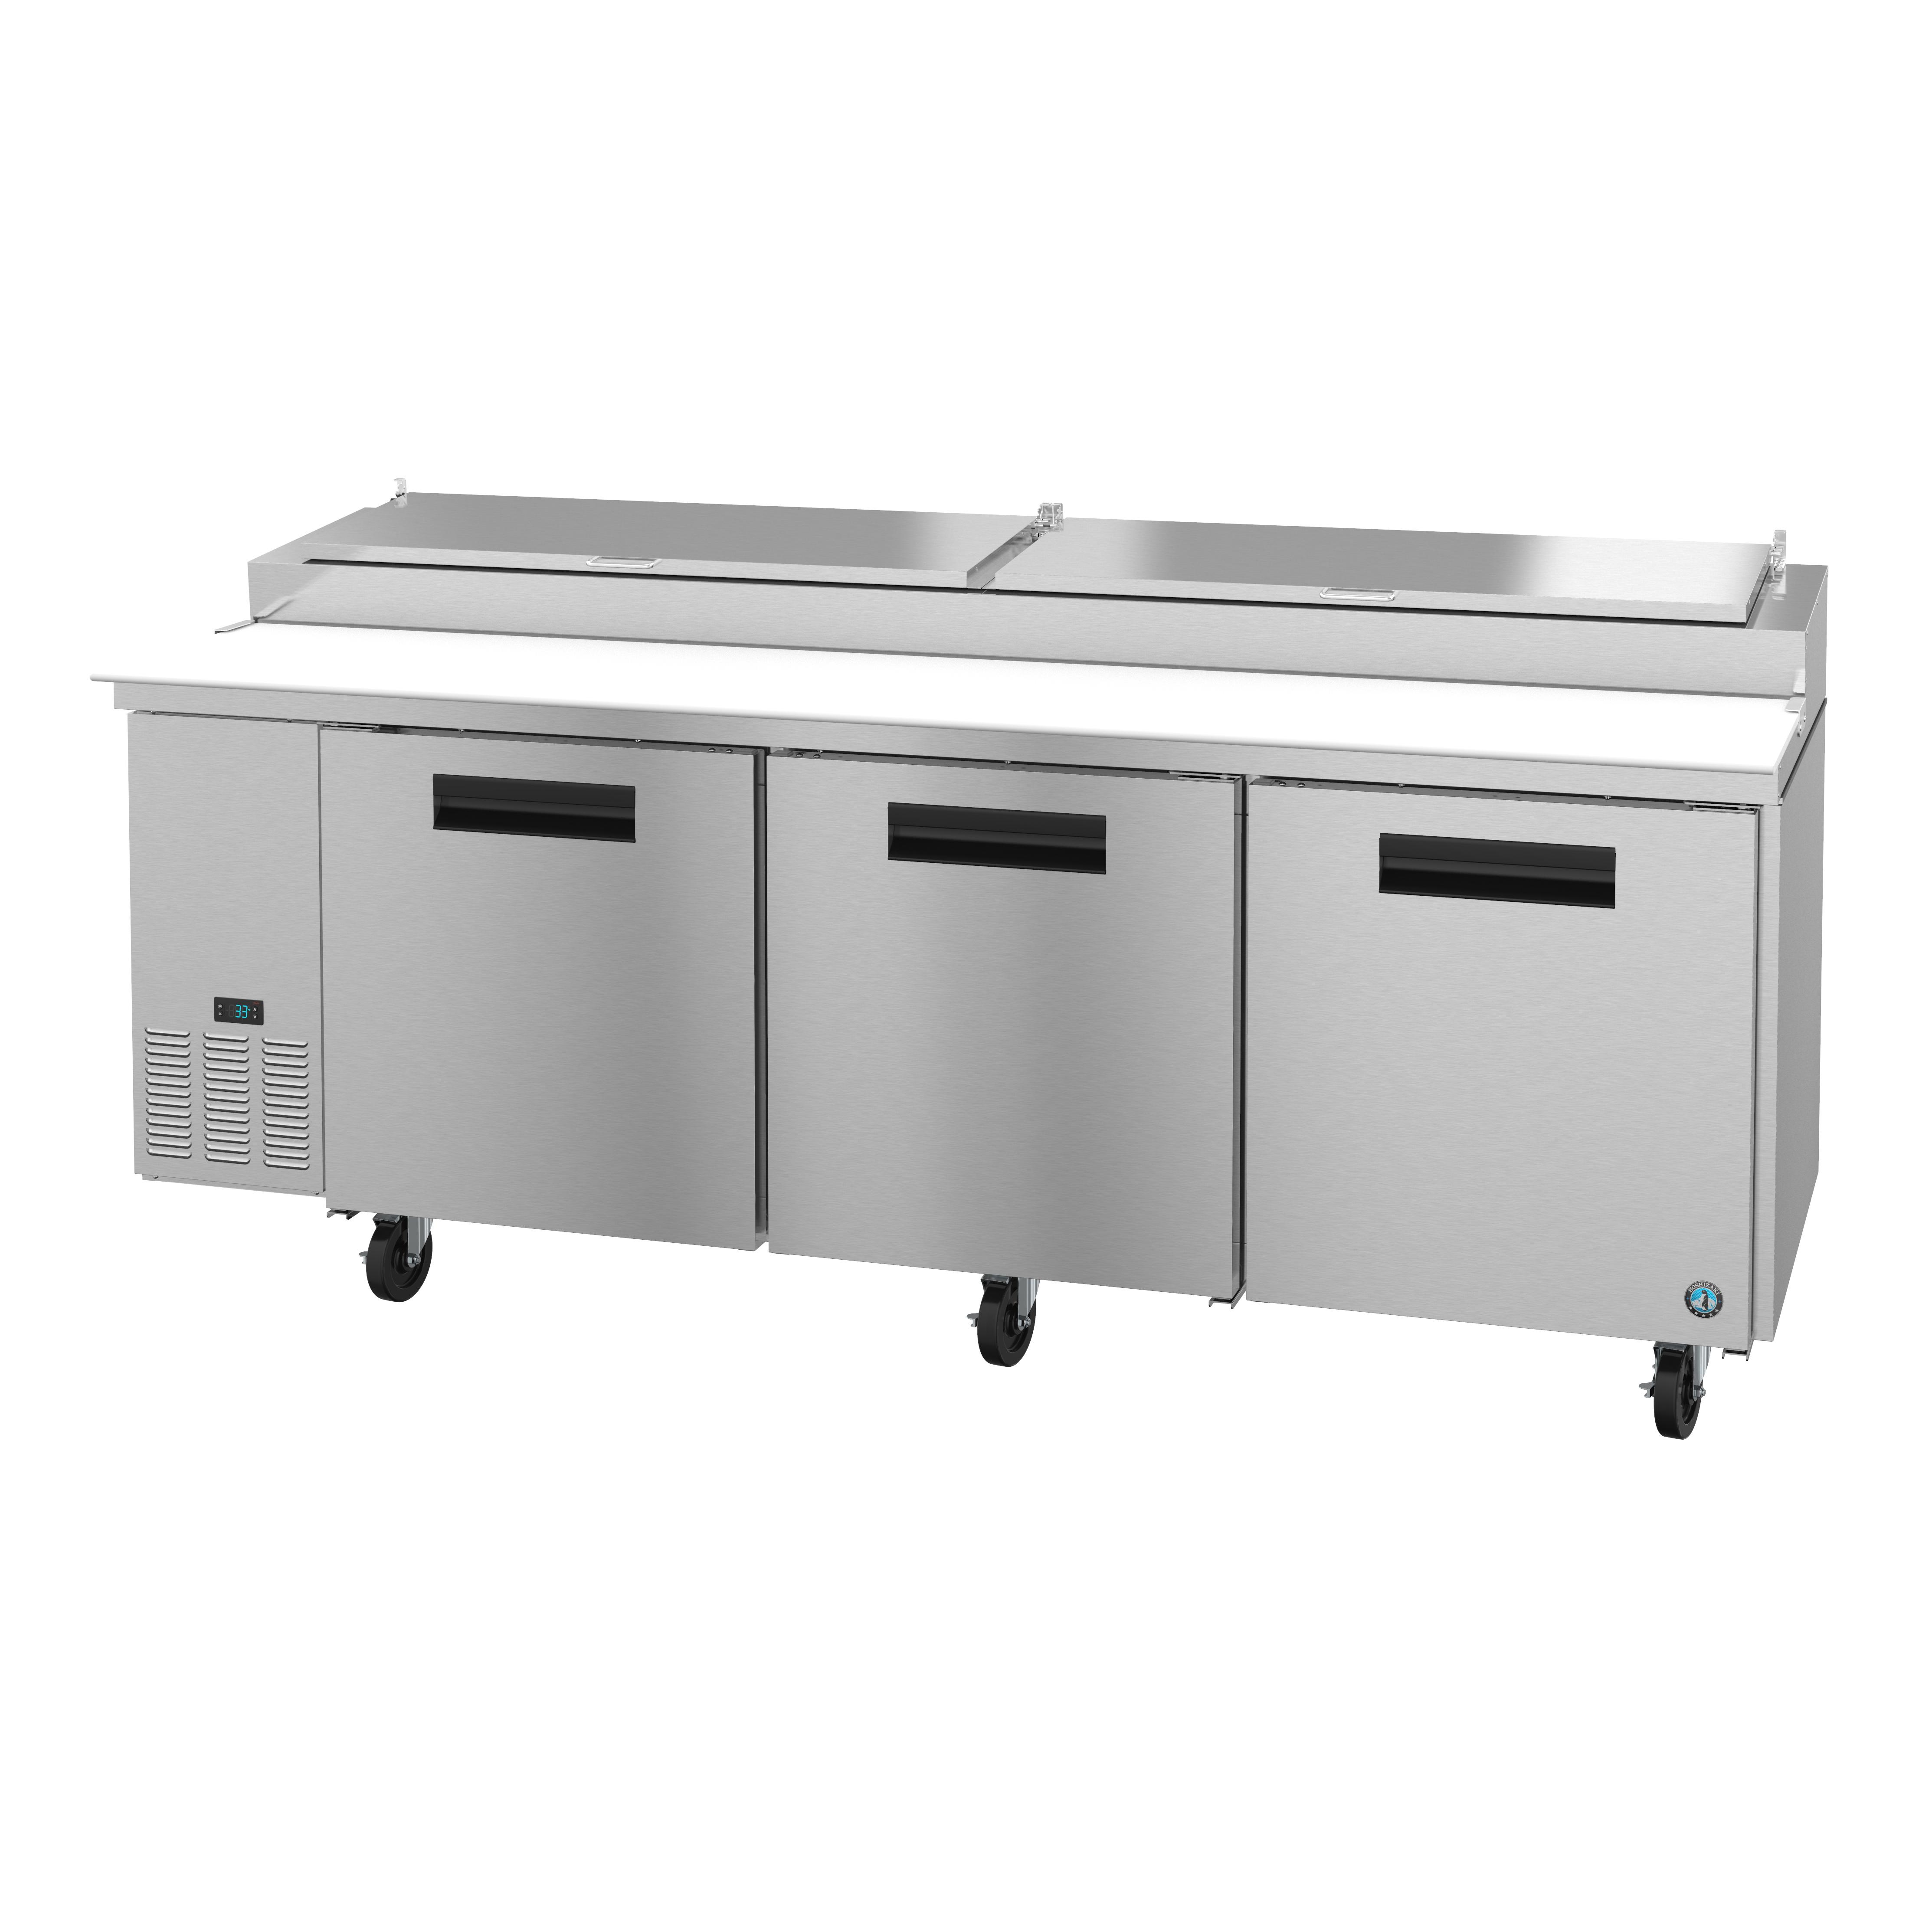 Hoshizaki PR93A refrigerated counter, pizza prep table